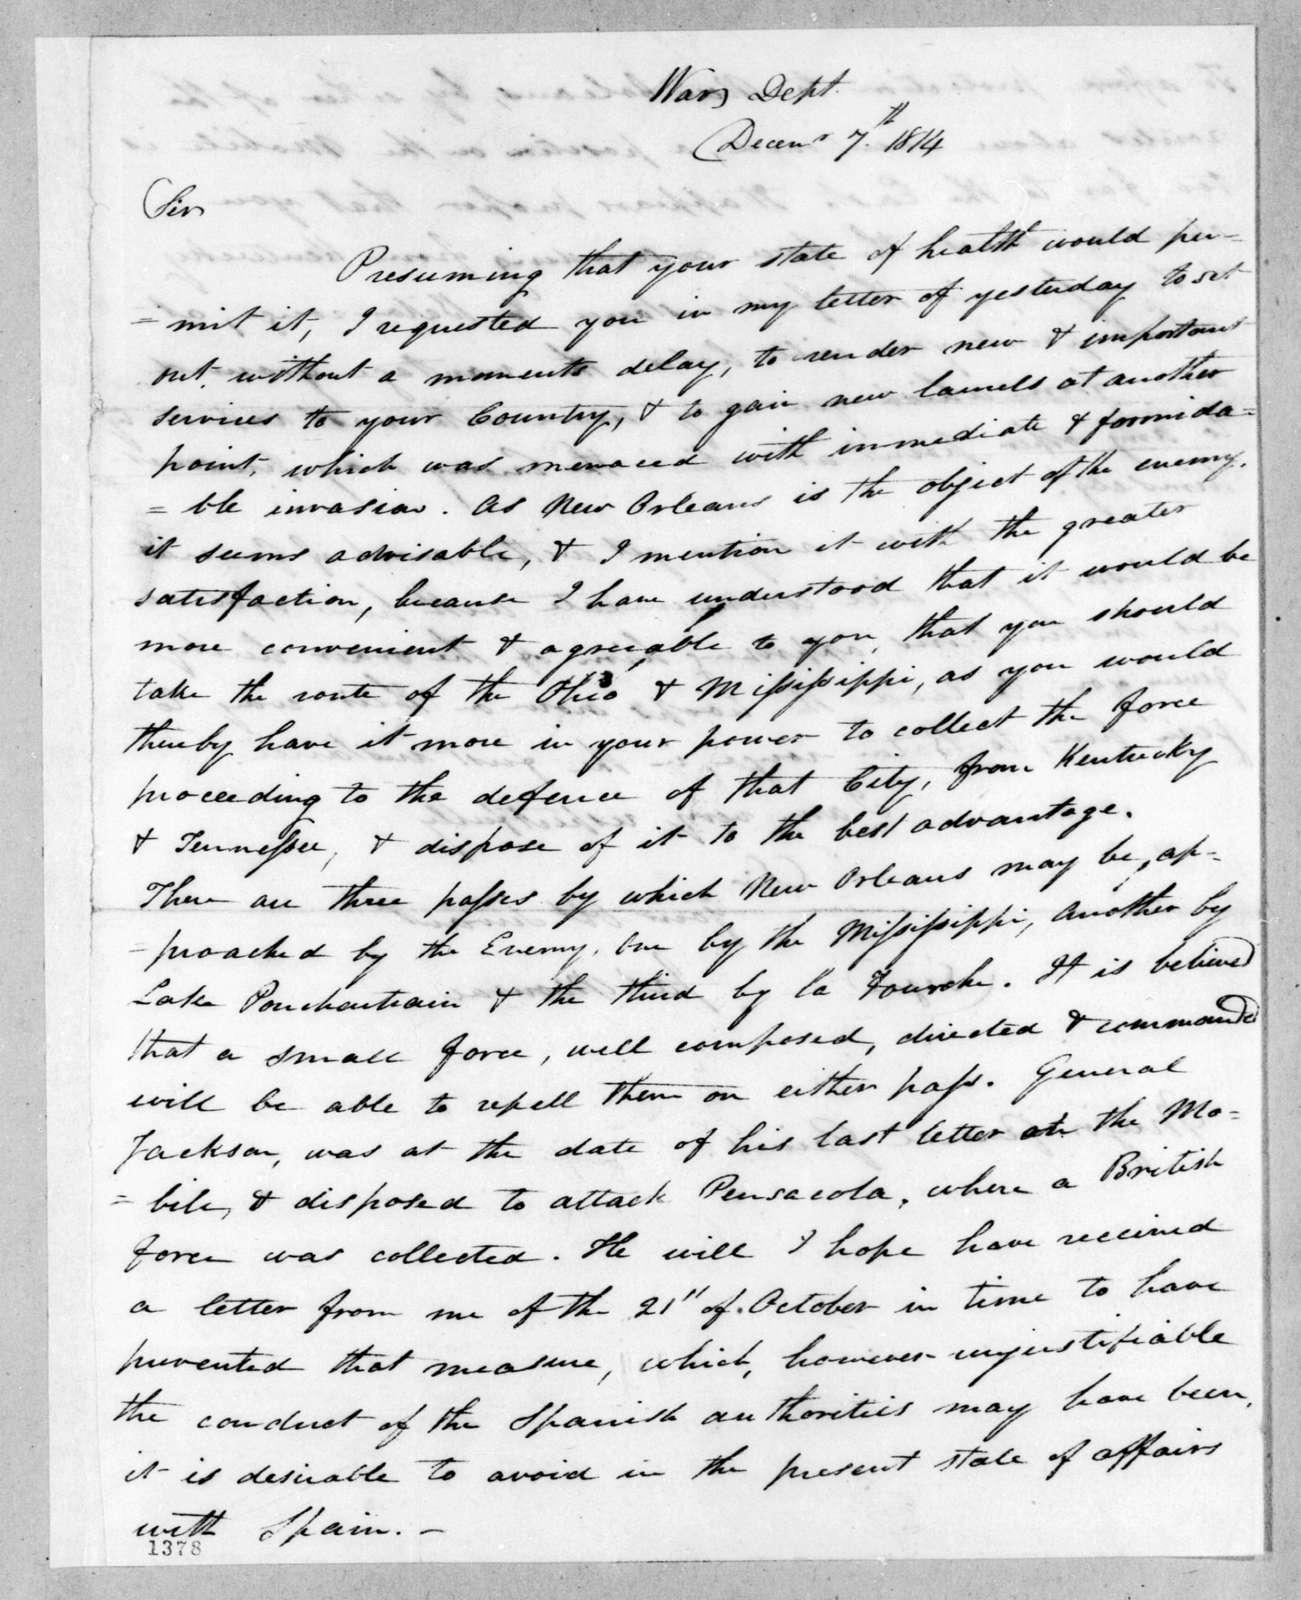 James Monroe to Andrew Jackson, December 7, 1814